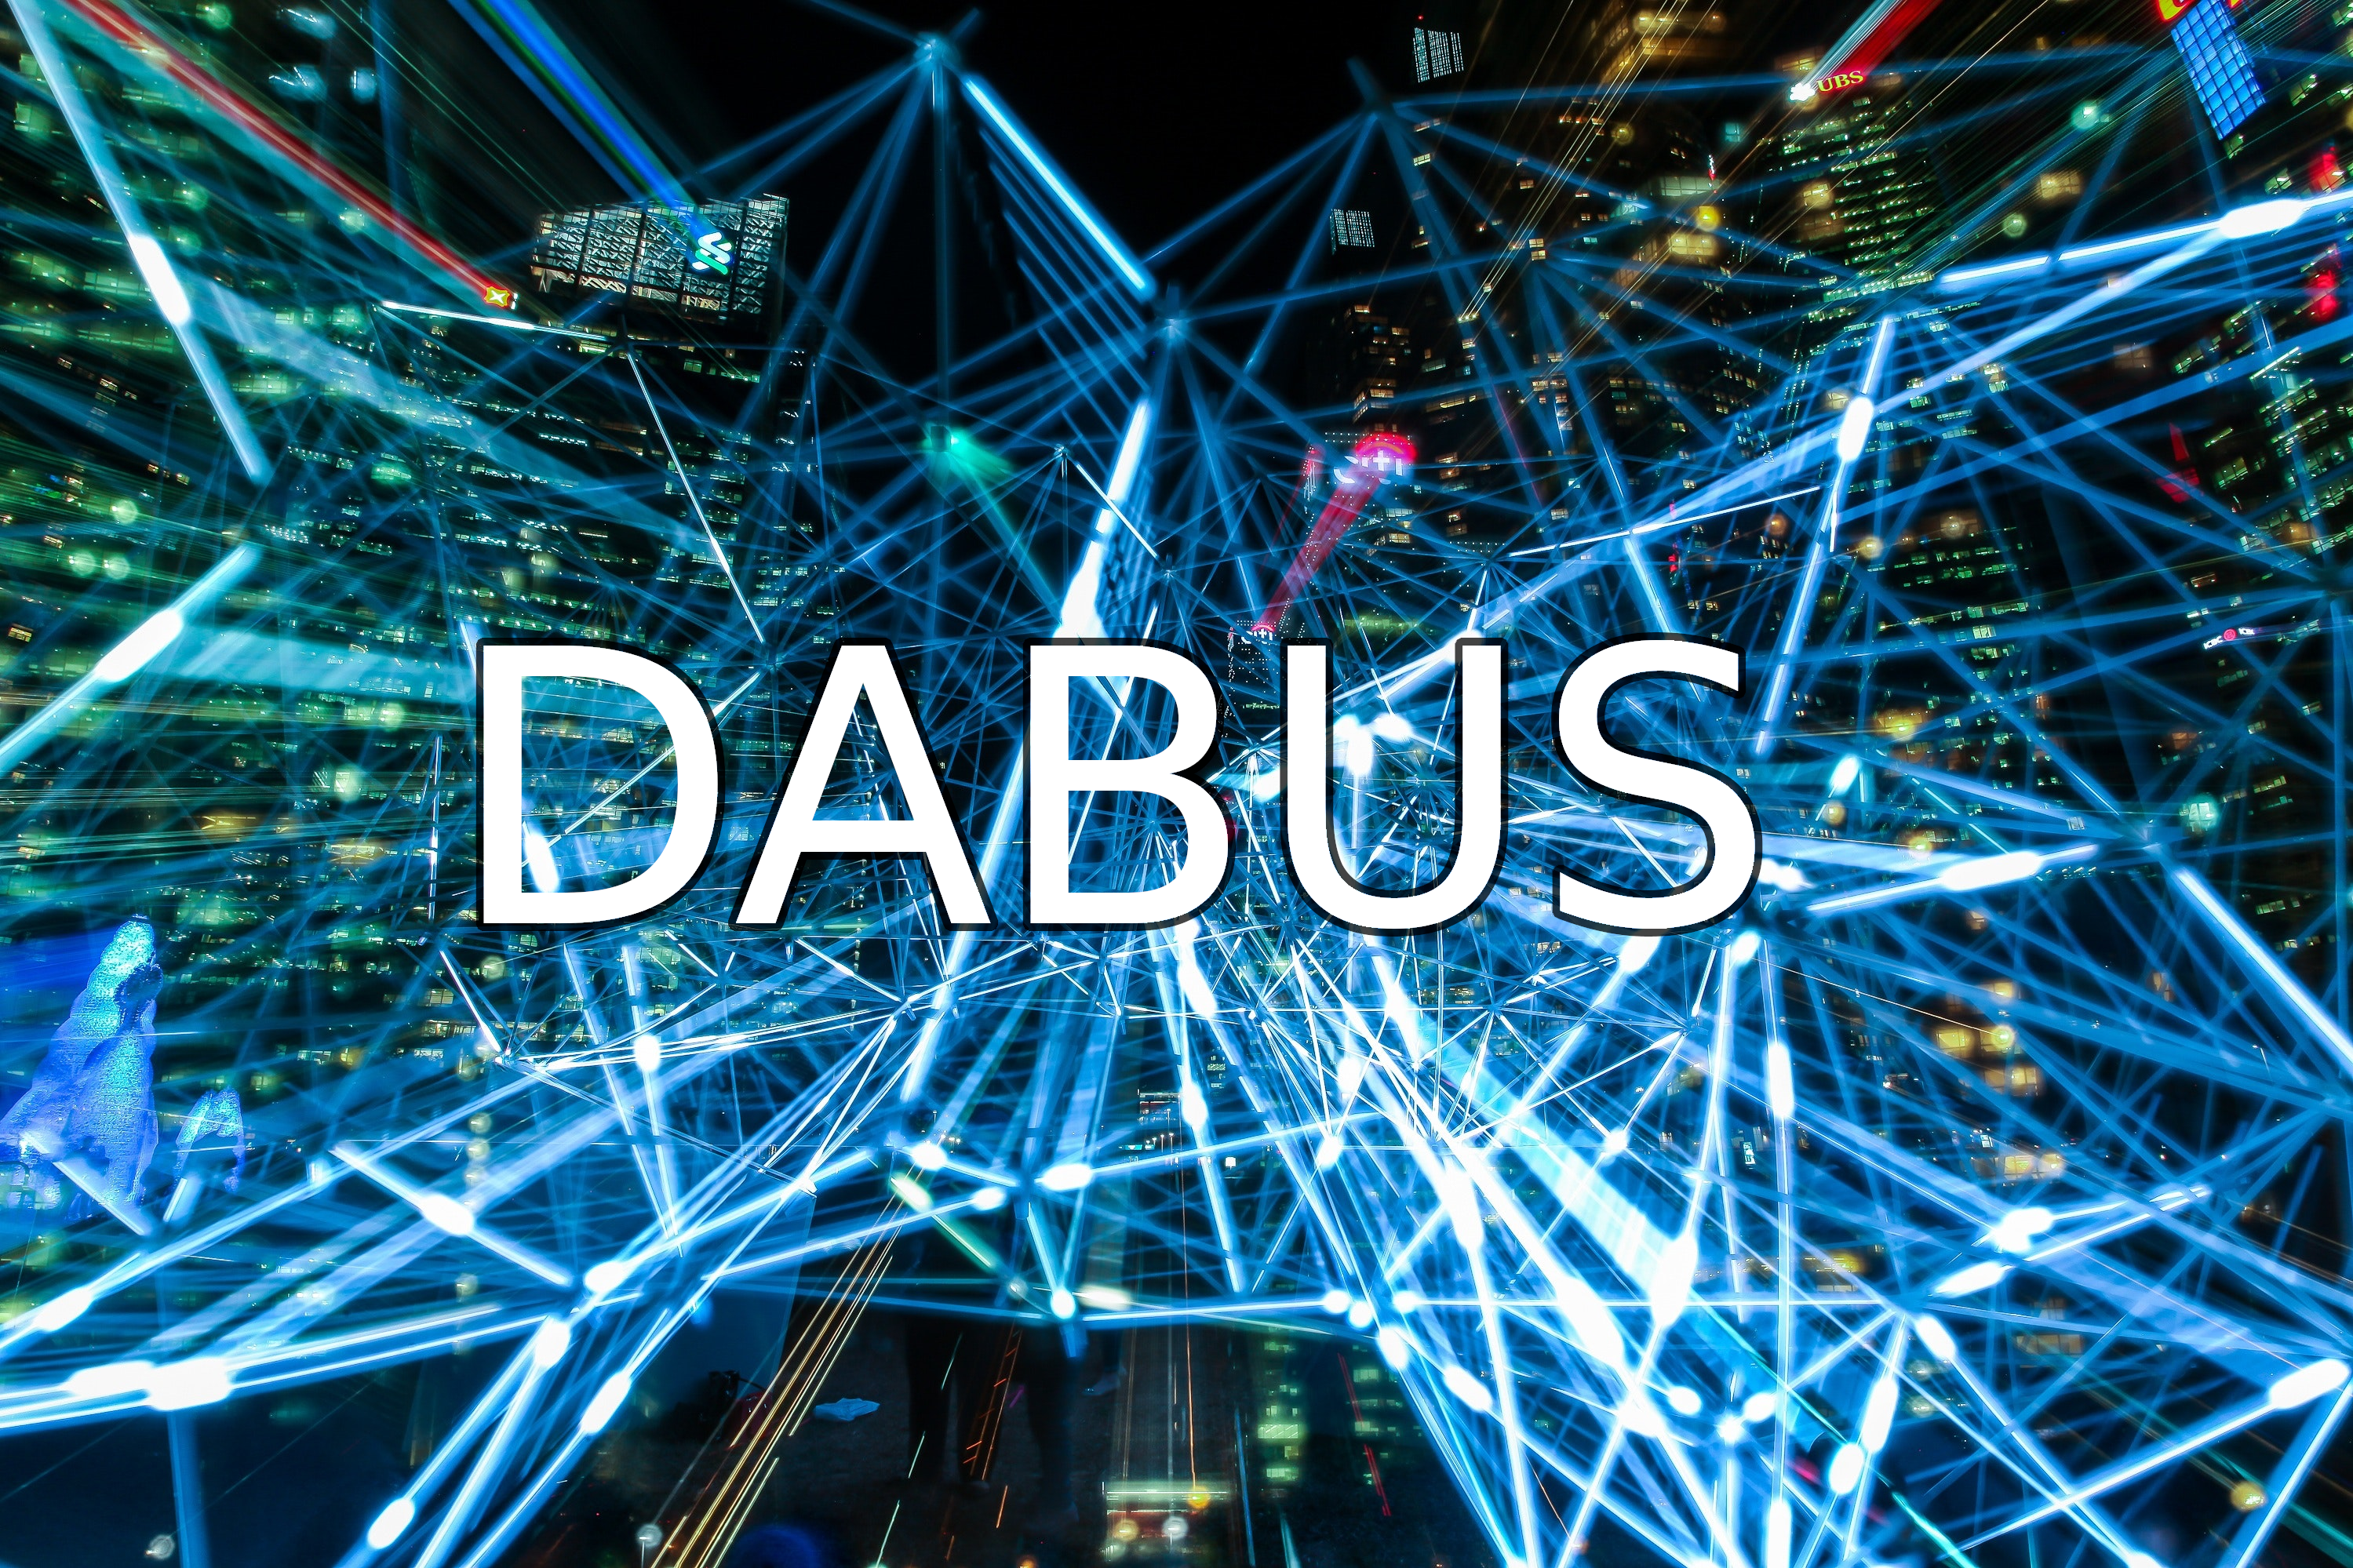 Meet DABUS: Artist, Inventor, Artificial Intelligence